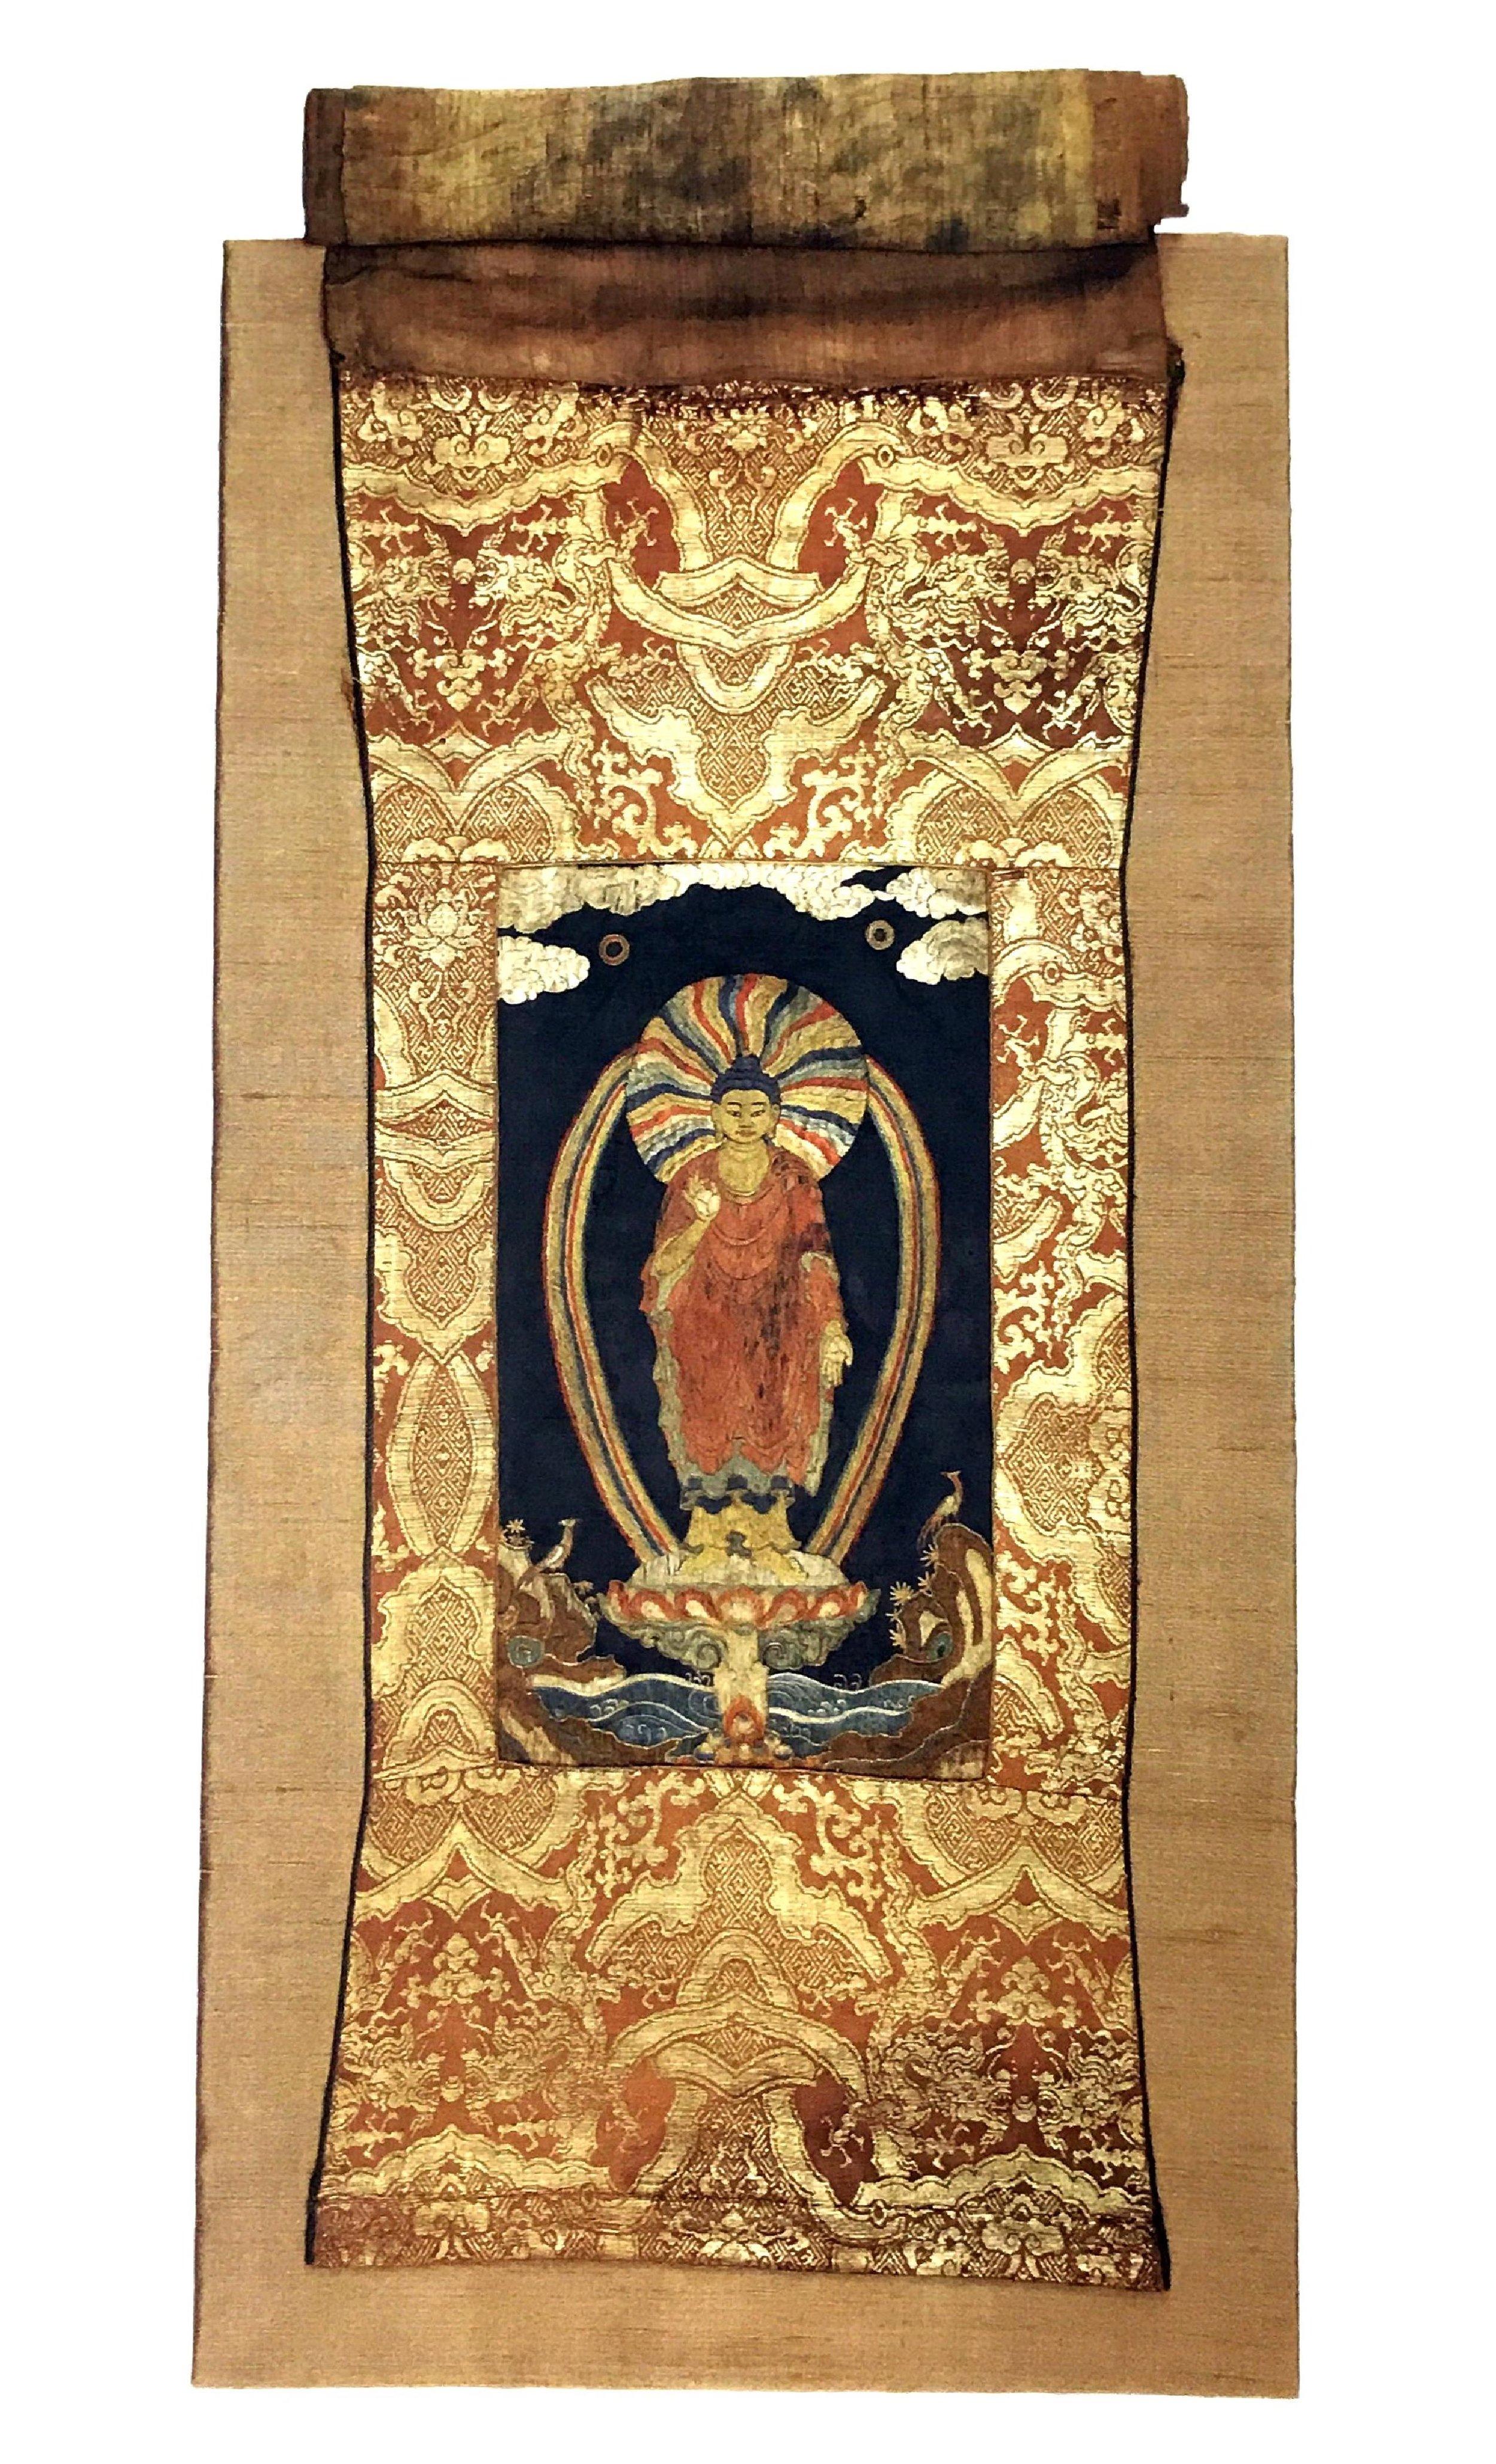 Thangka of Shakyamuni Buddha.  China, 15th century. Silk satin (embroidered); brocade border and veil. Collection of Chris Hall. Image courtesy of Asian Civilizations Museum.